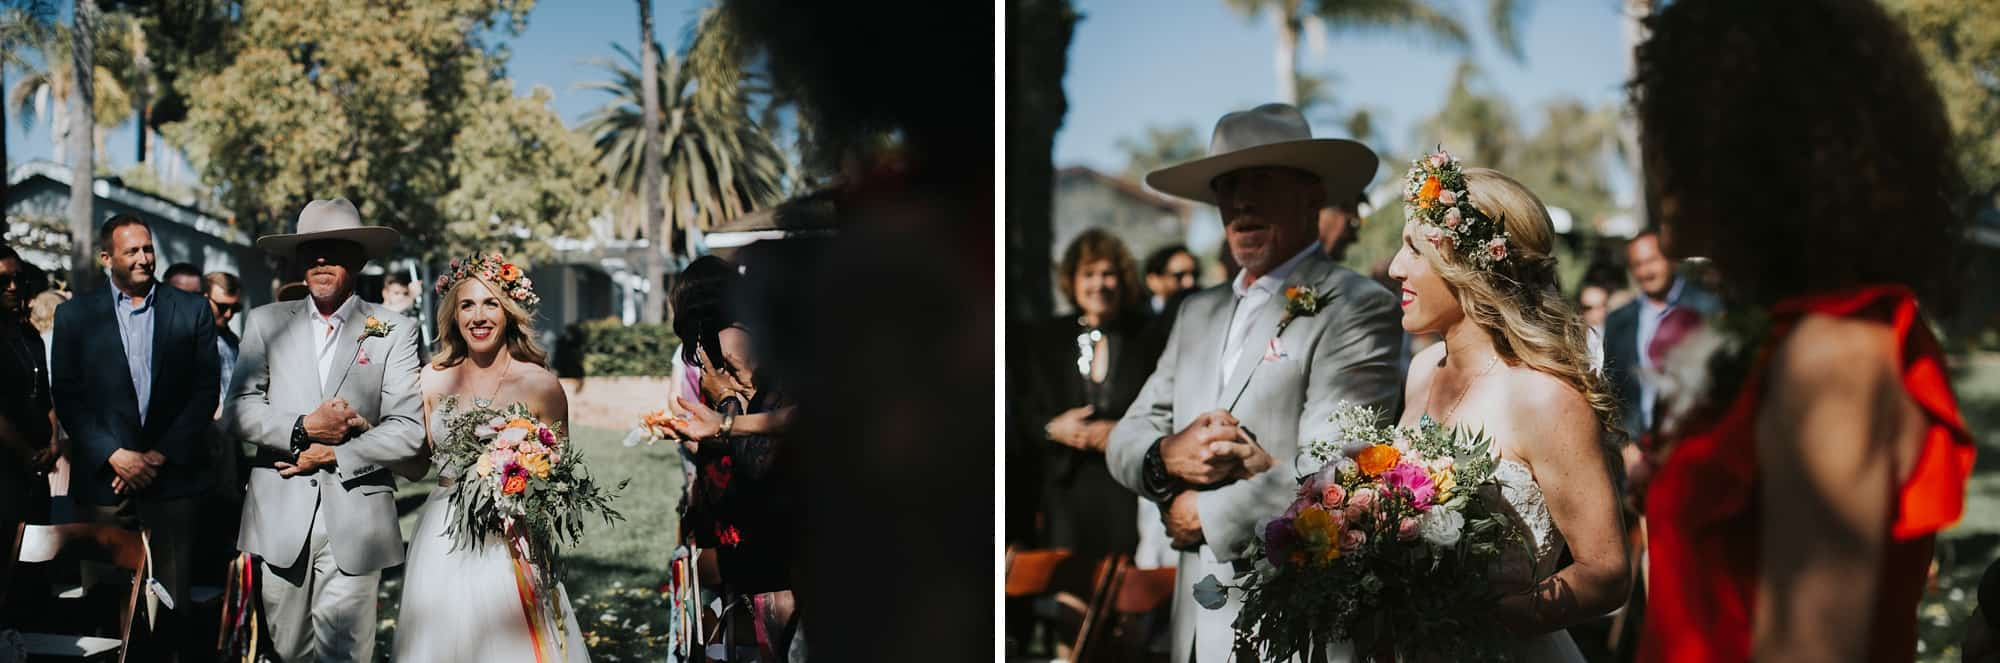 Victoria Carlson Colorful Floral San Diego Wedding_0045